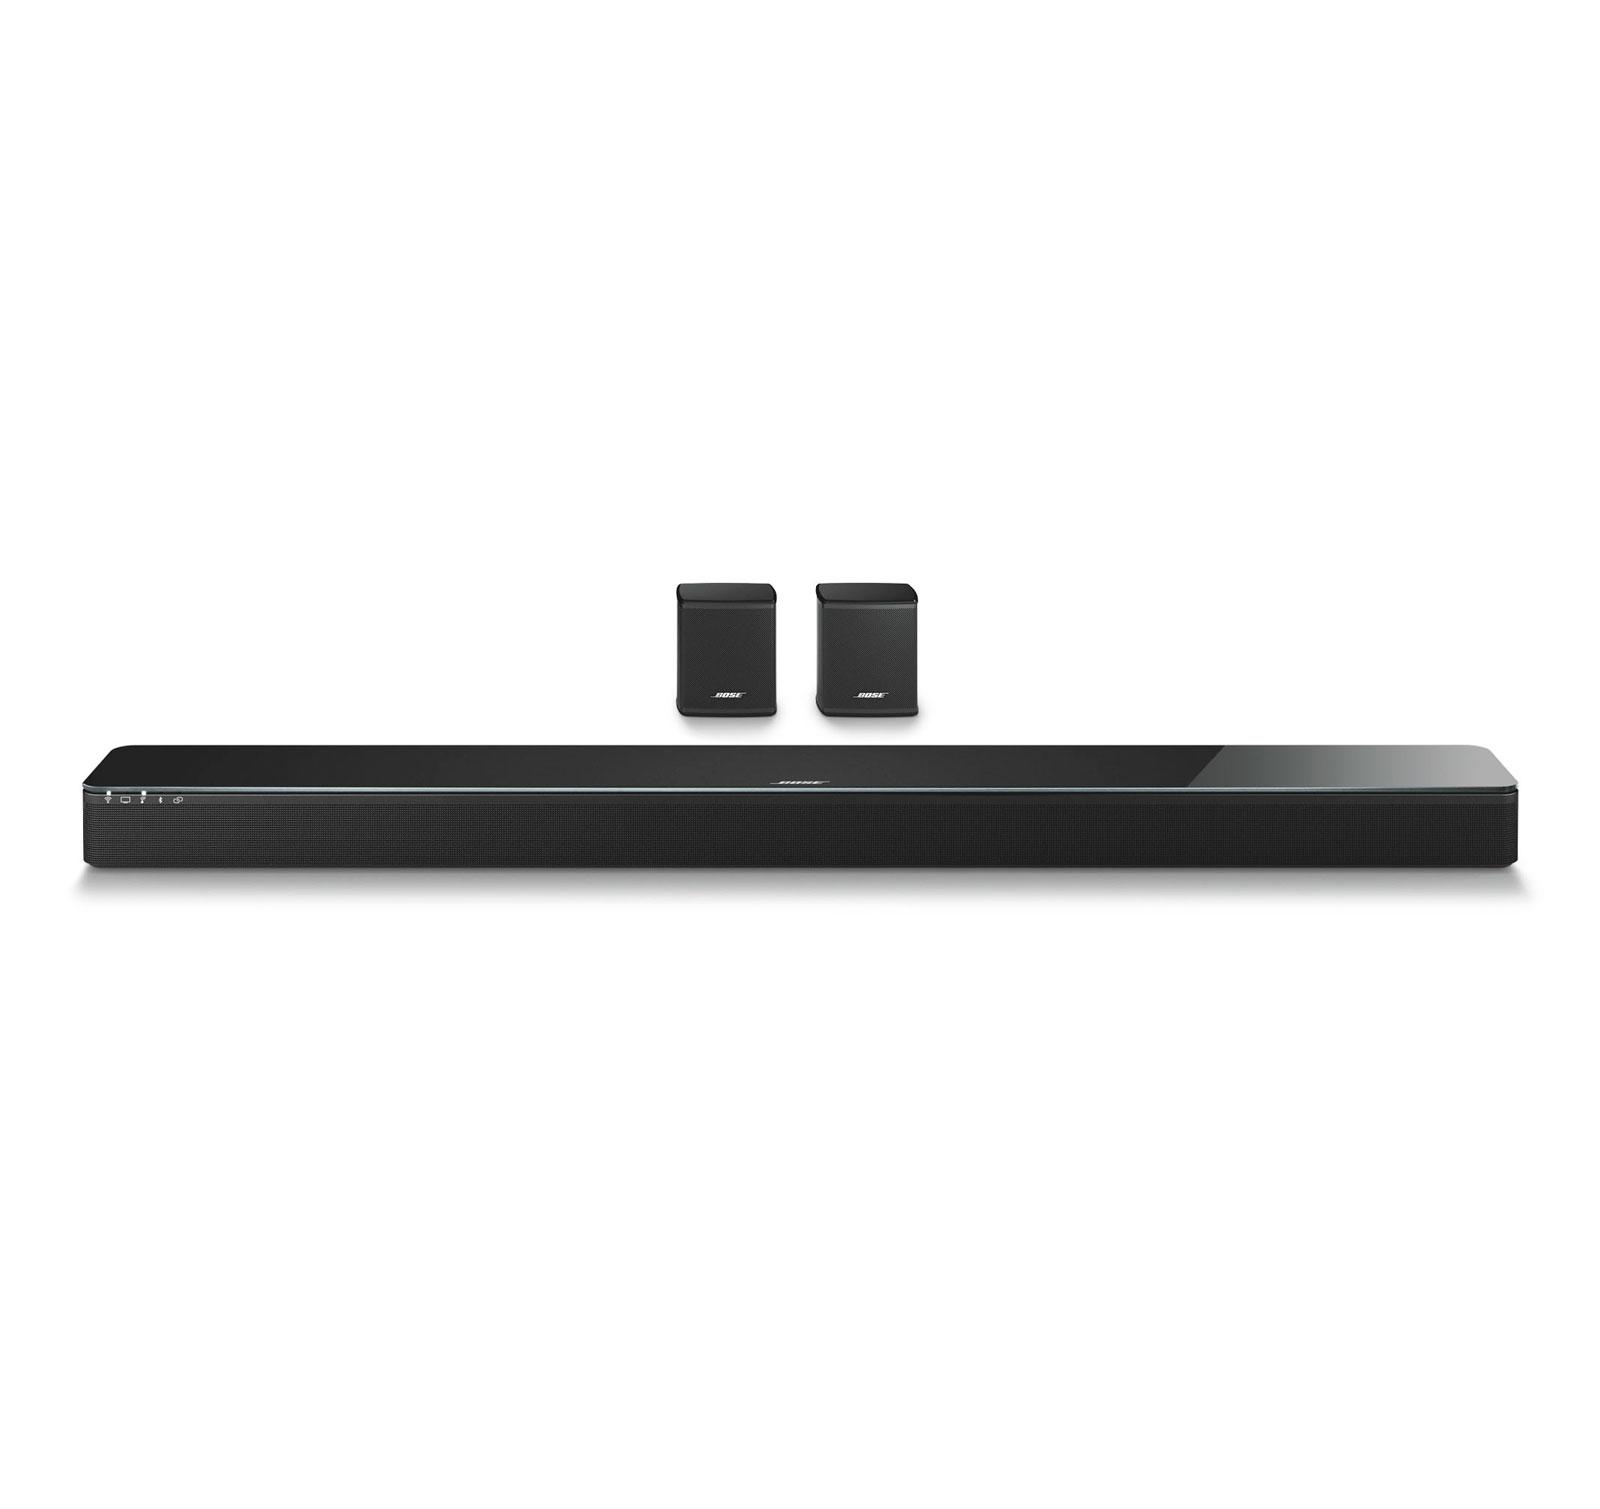 bose soundtouch 300 black soundbar kit w virtually. Black Bedroom Furniture Sets. Home Design Ideas